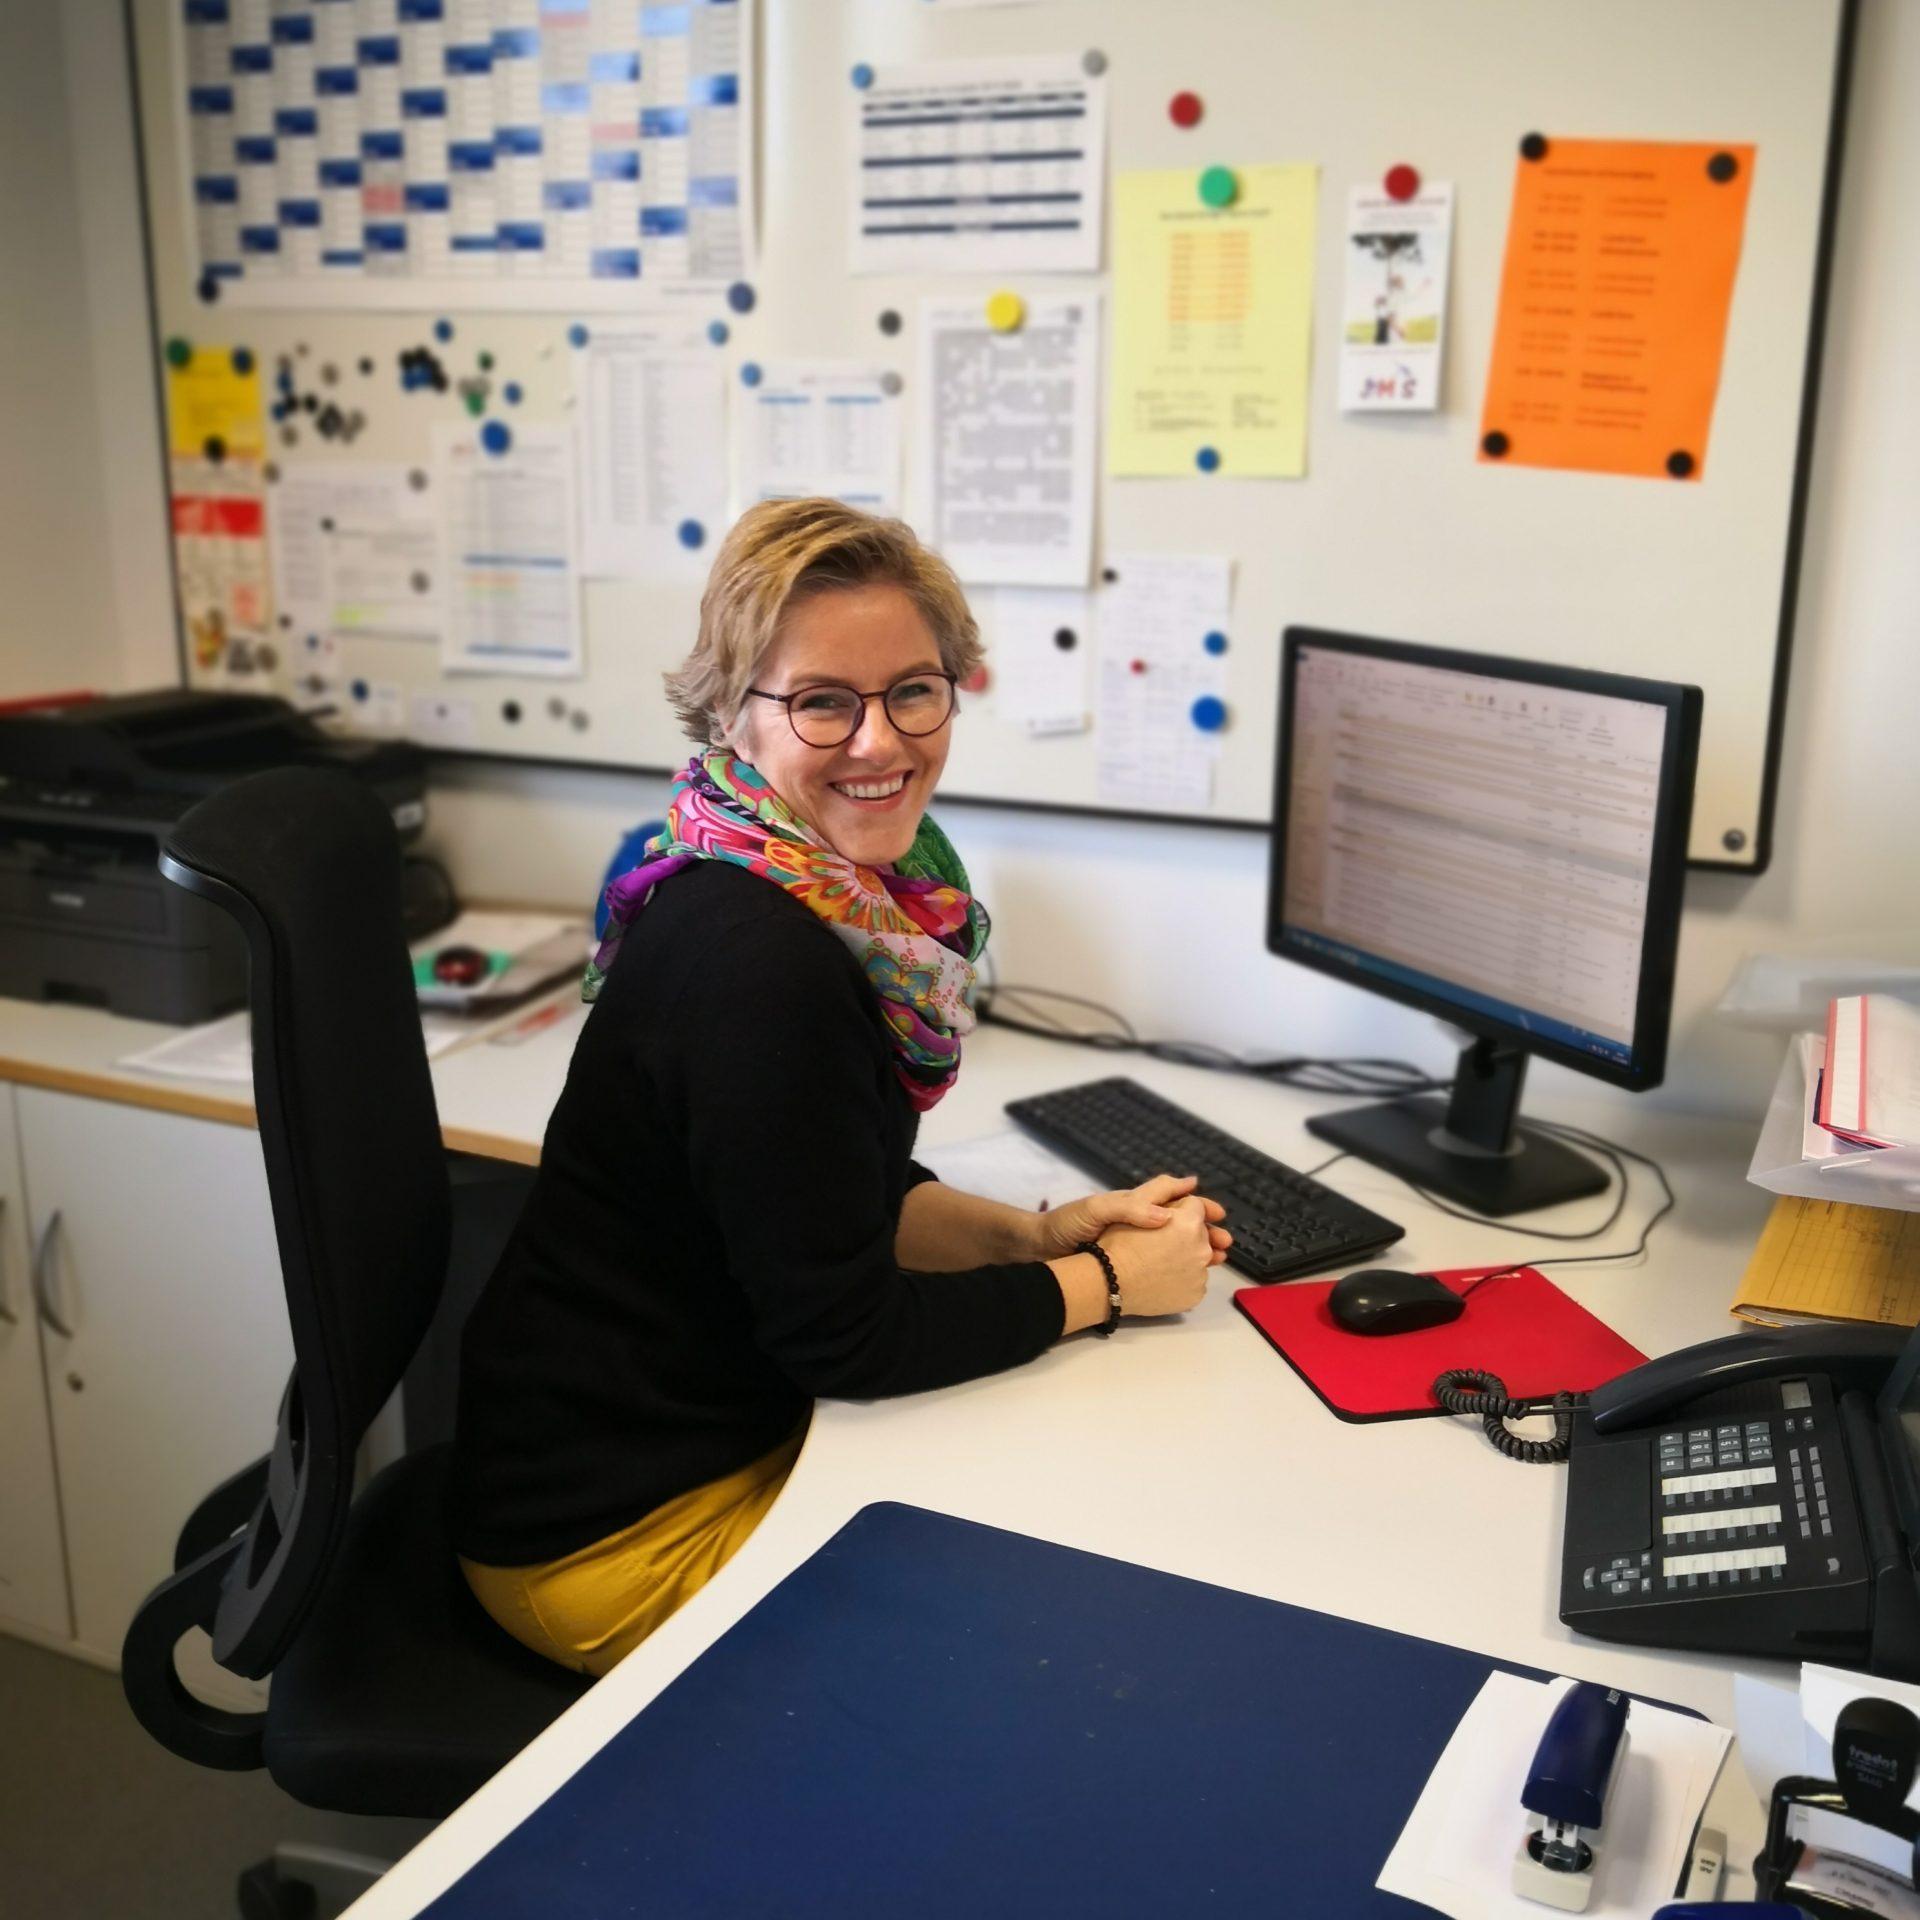 Manuela Schäfer